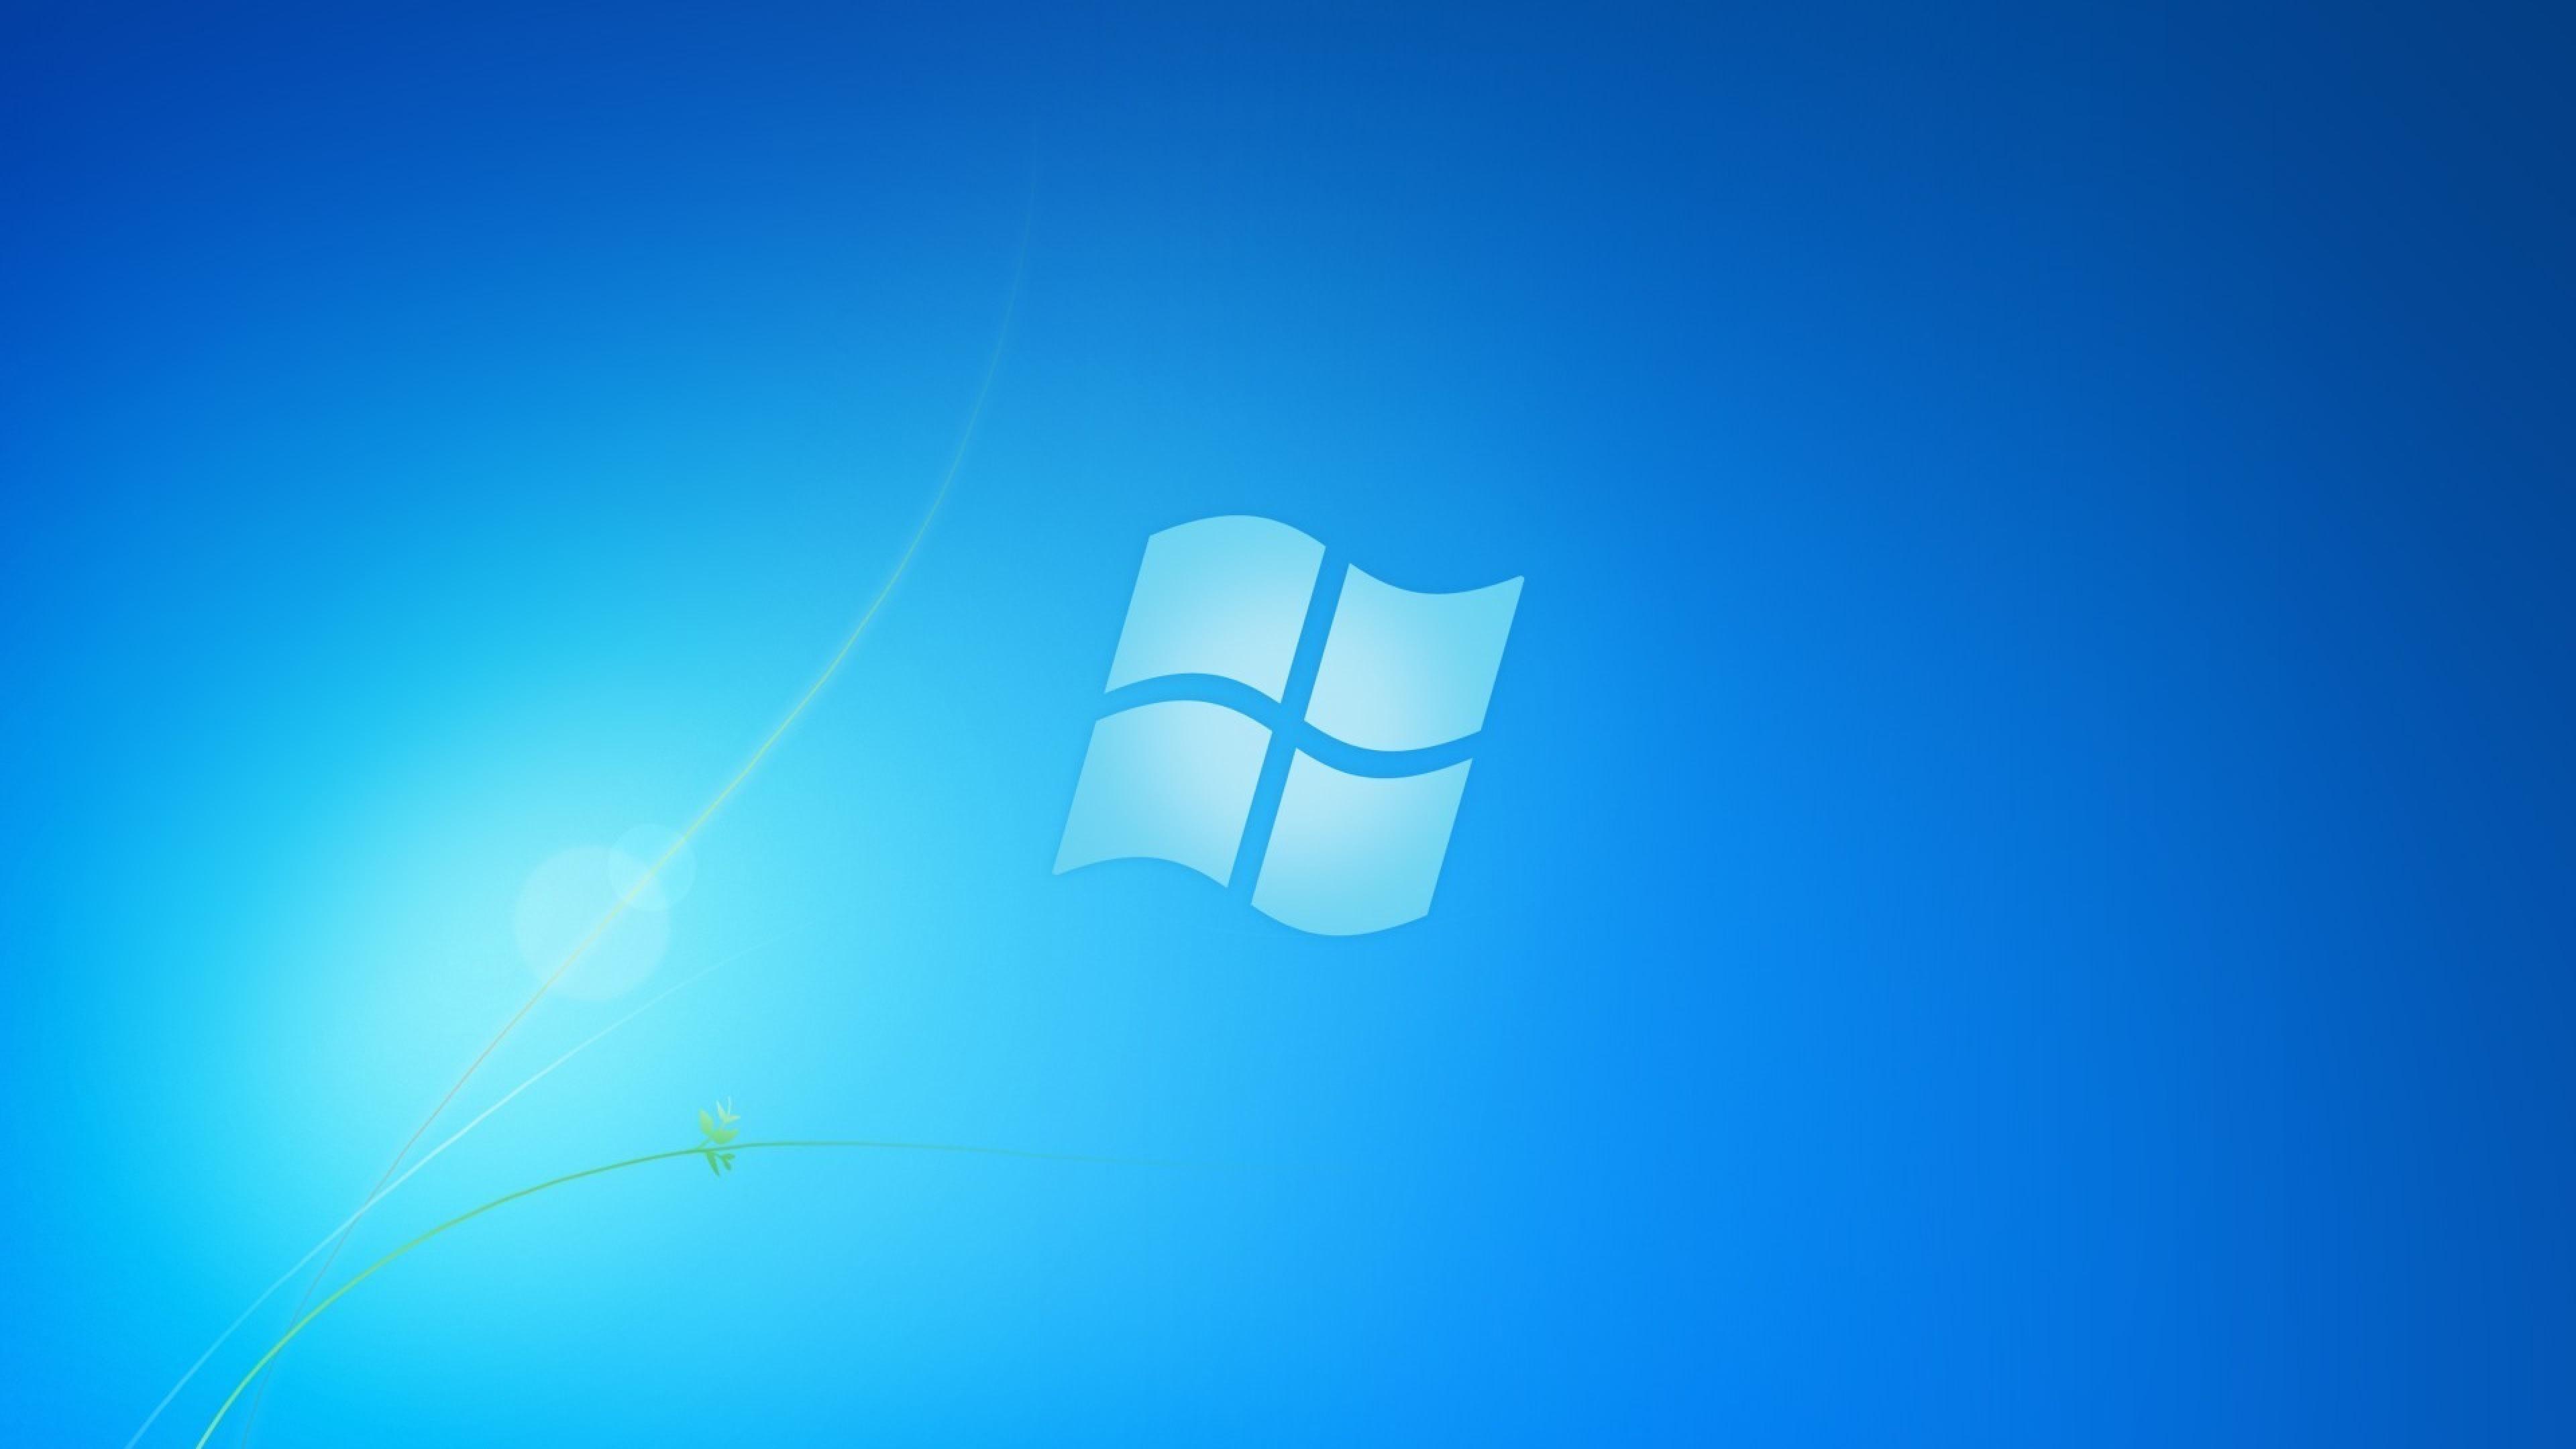 Windows 10 Wallpaper 4k 4k Wallpaper